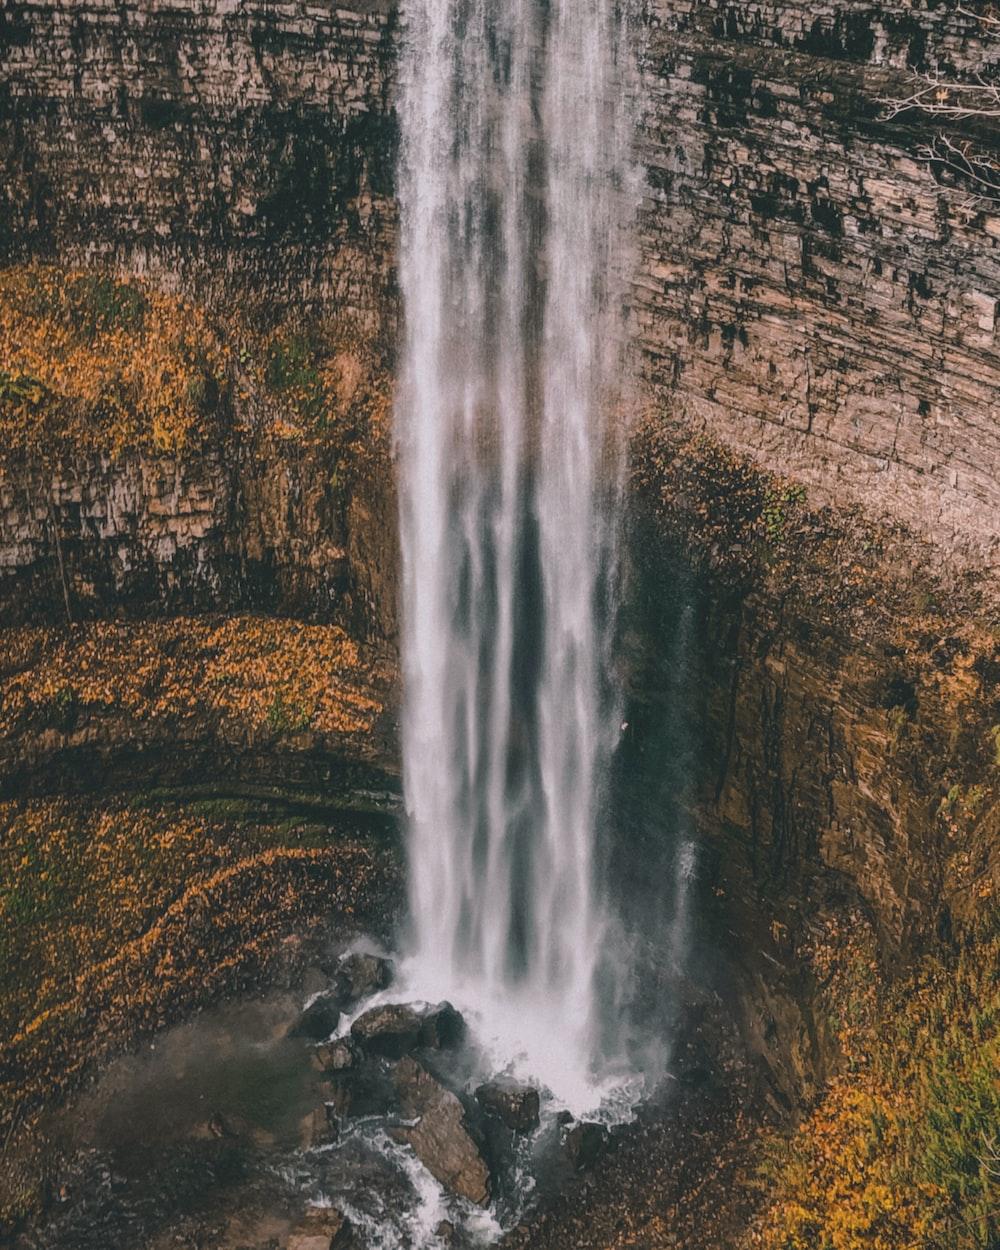 waterfalls photograph